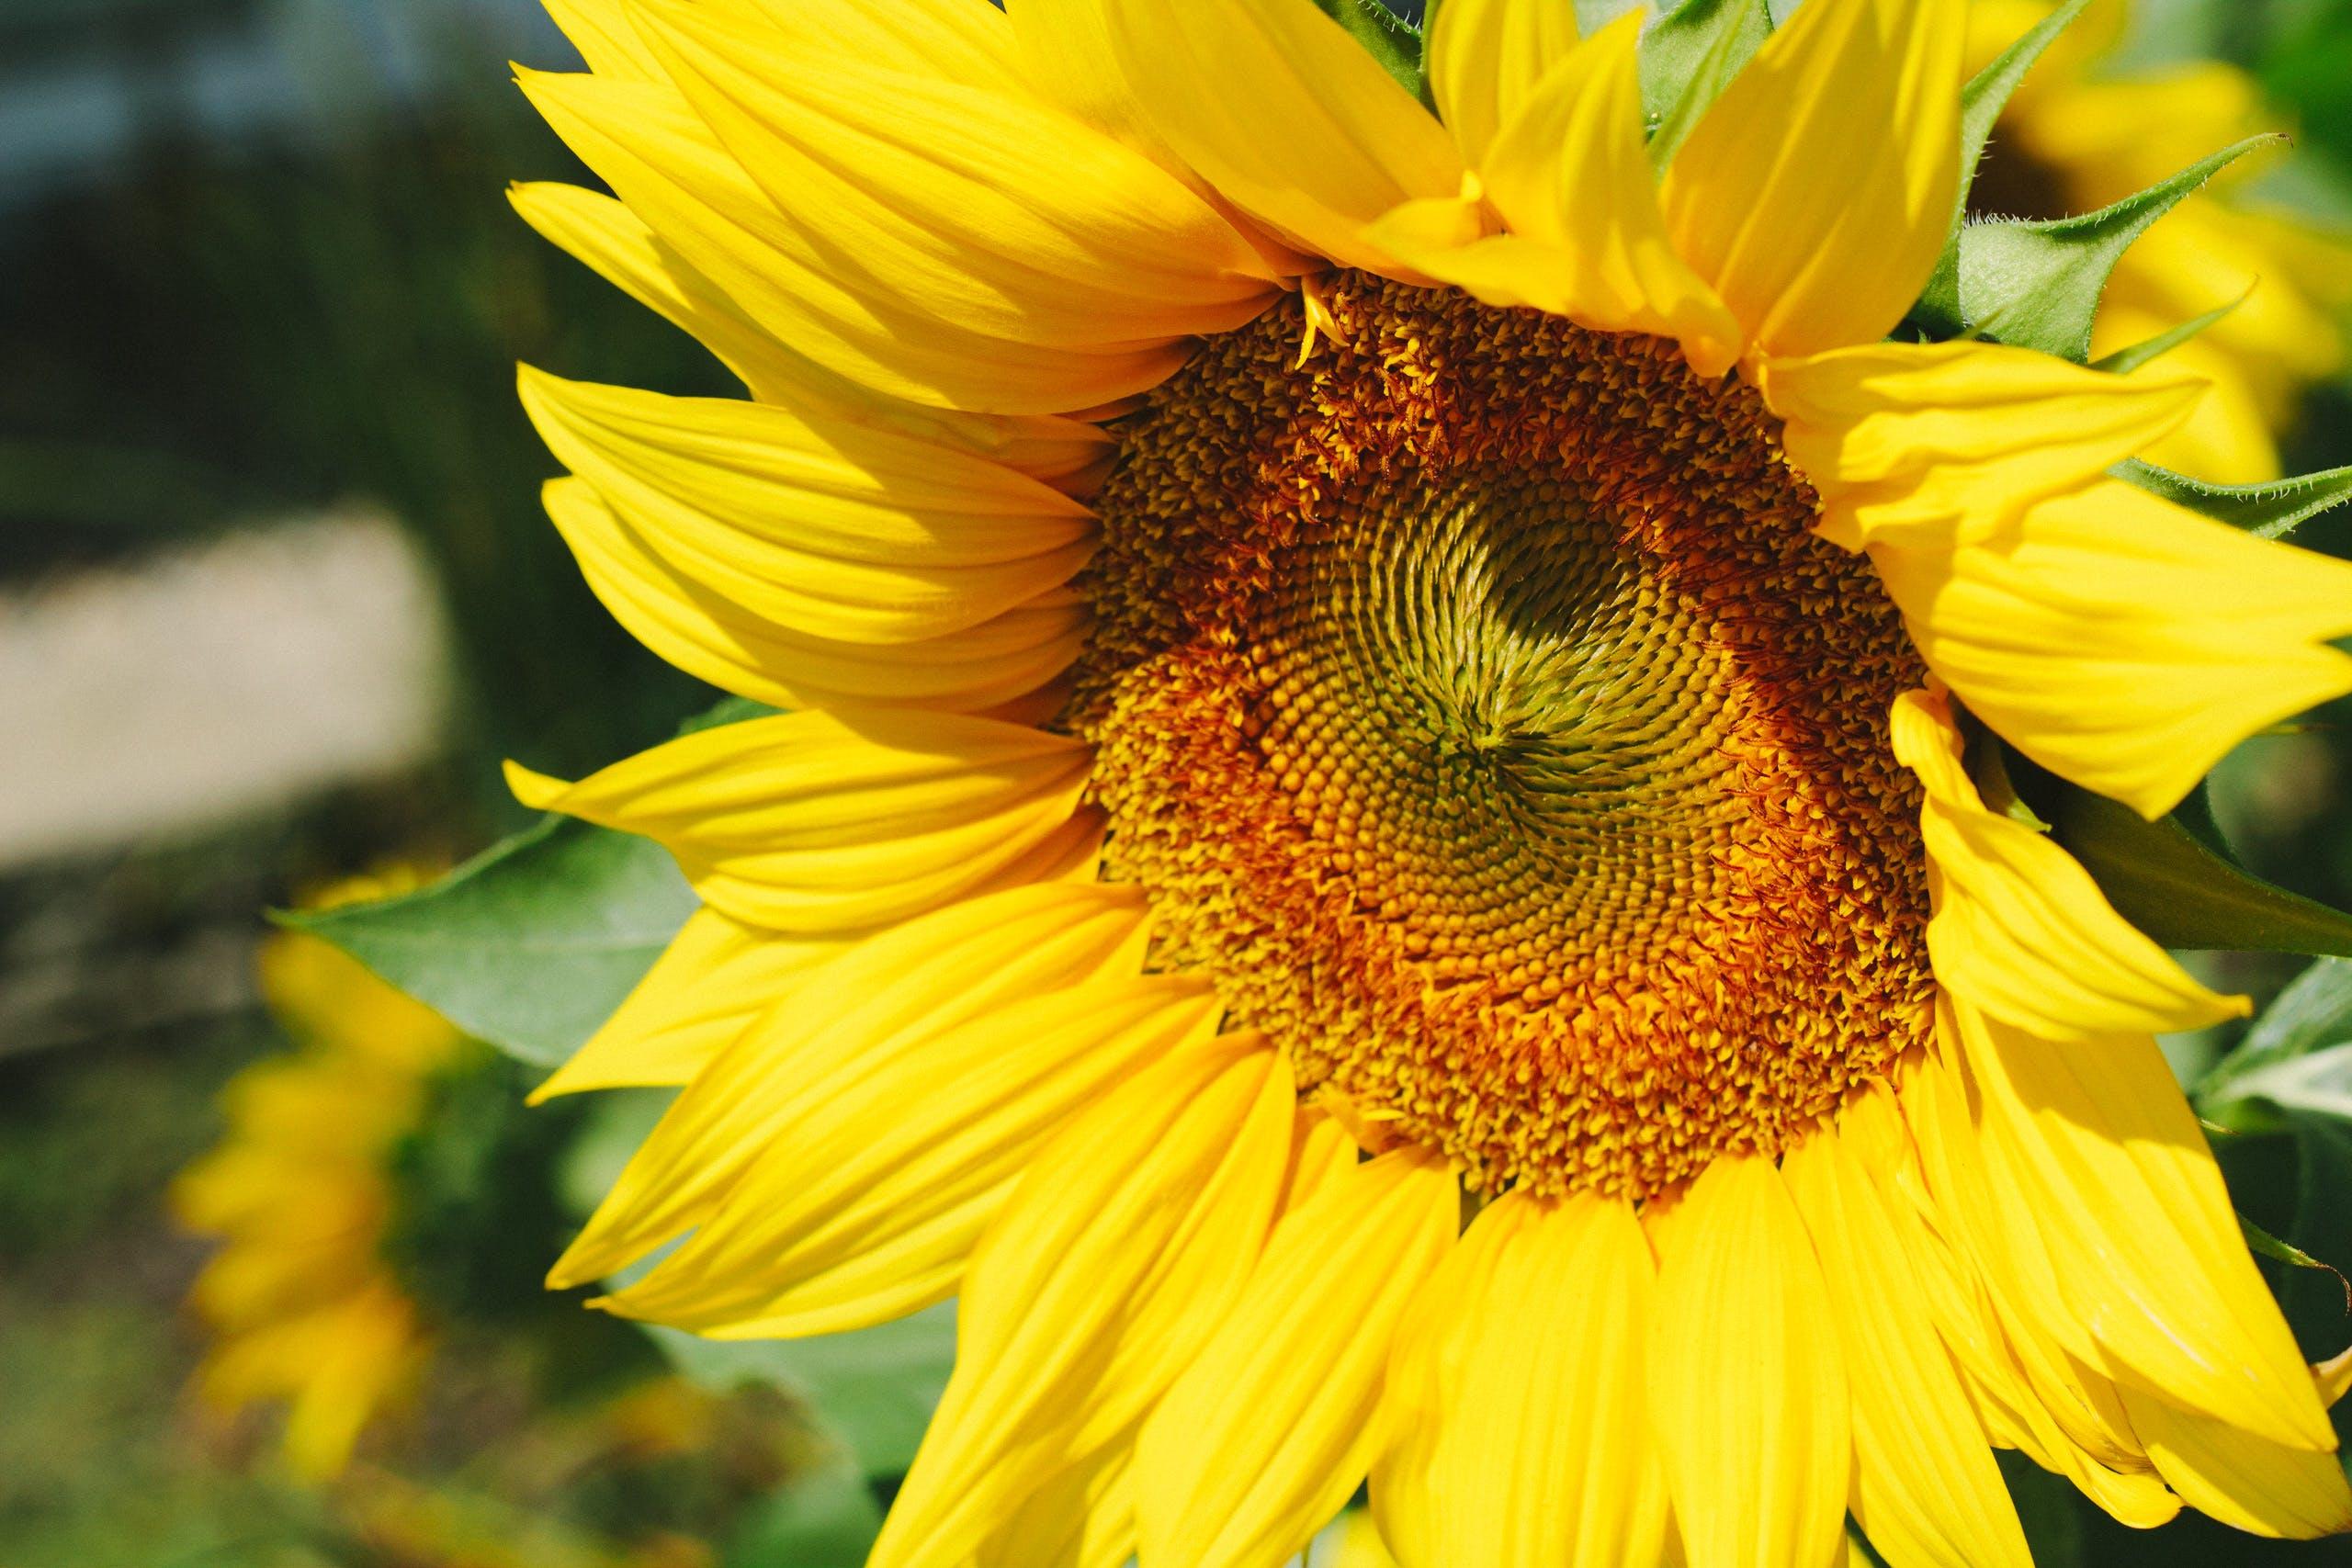 Close Up Photo of Sunflower